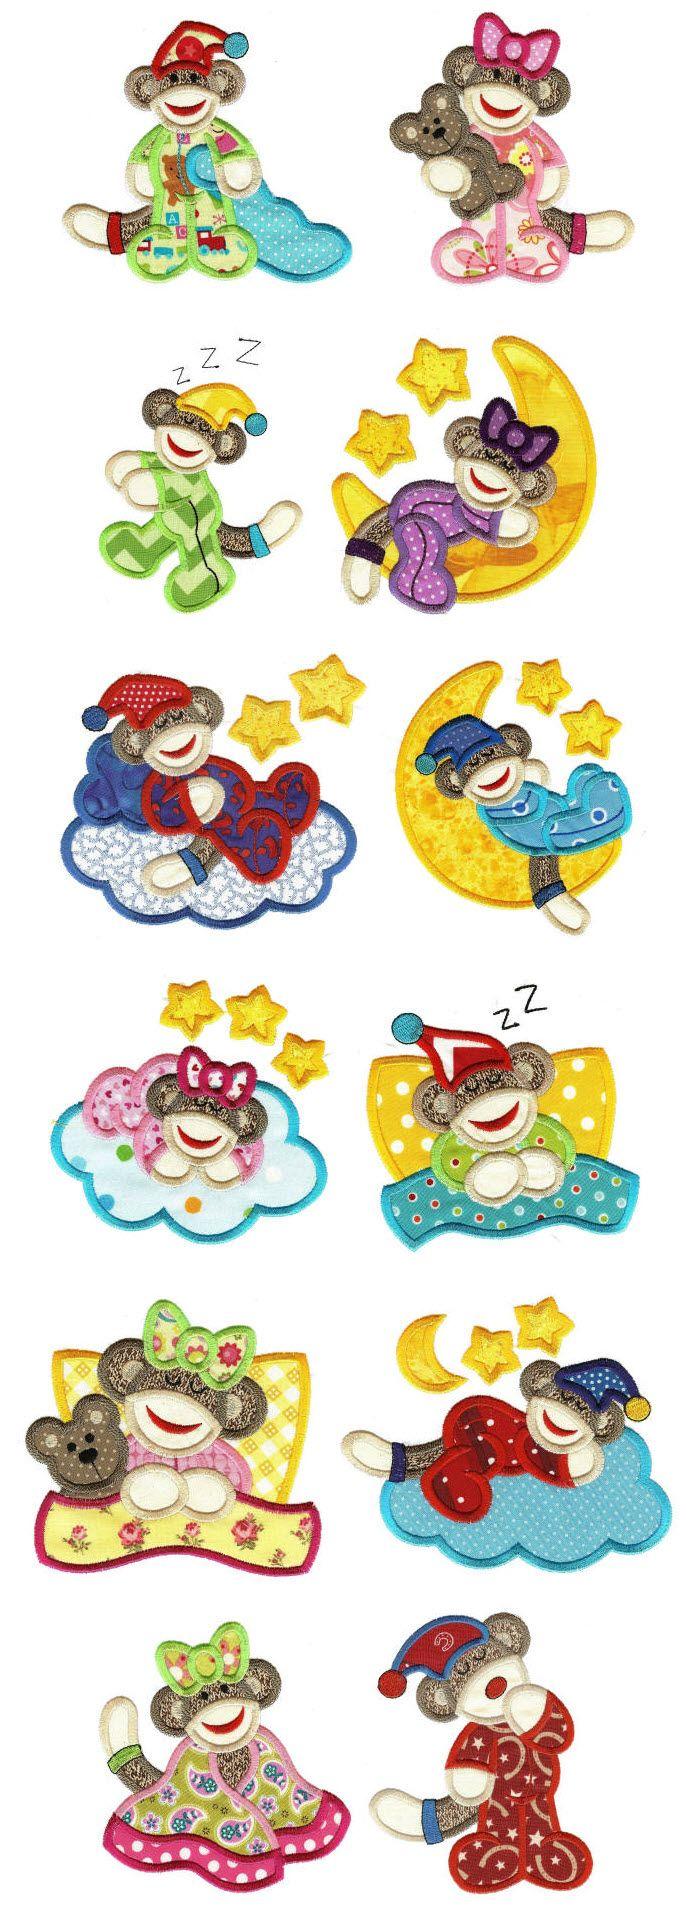 Embroidery   Applique Machine Embroidery Designs   Sleepy Slumber Sock Monkeys Applique